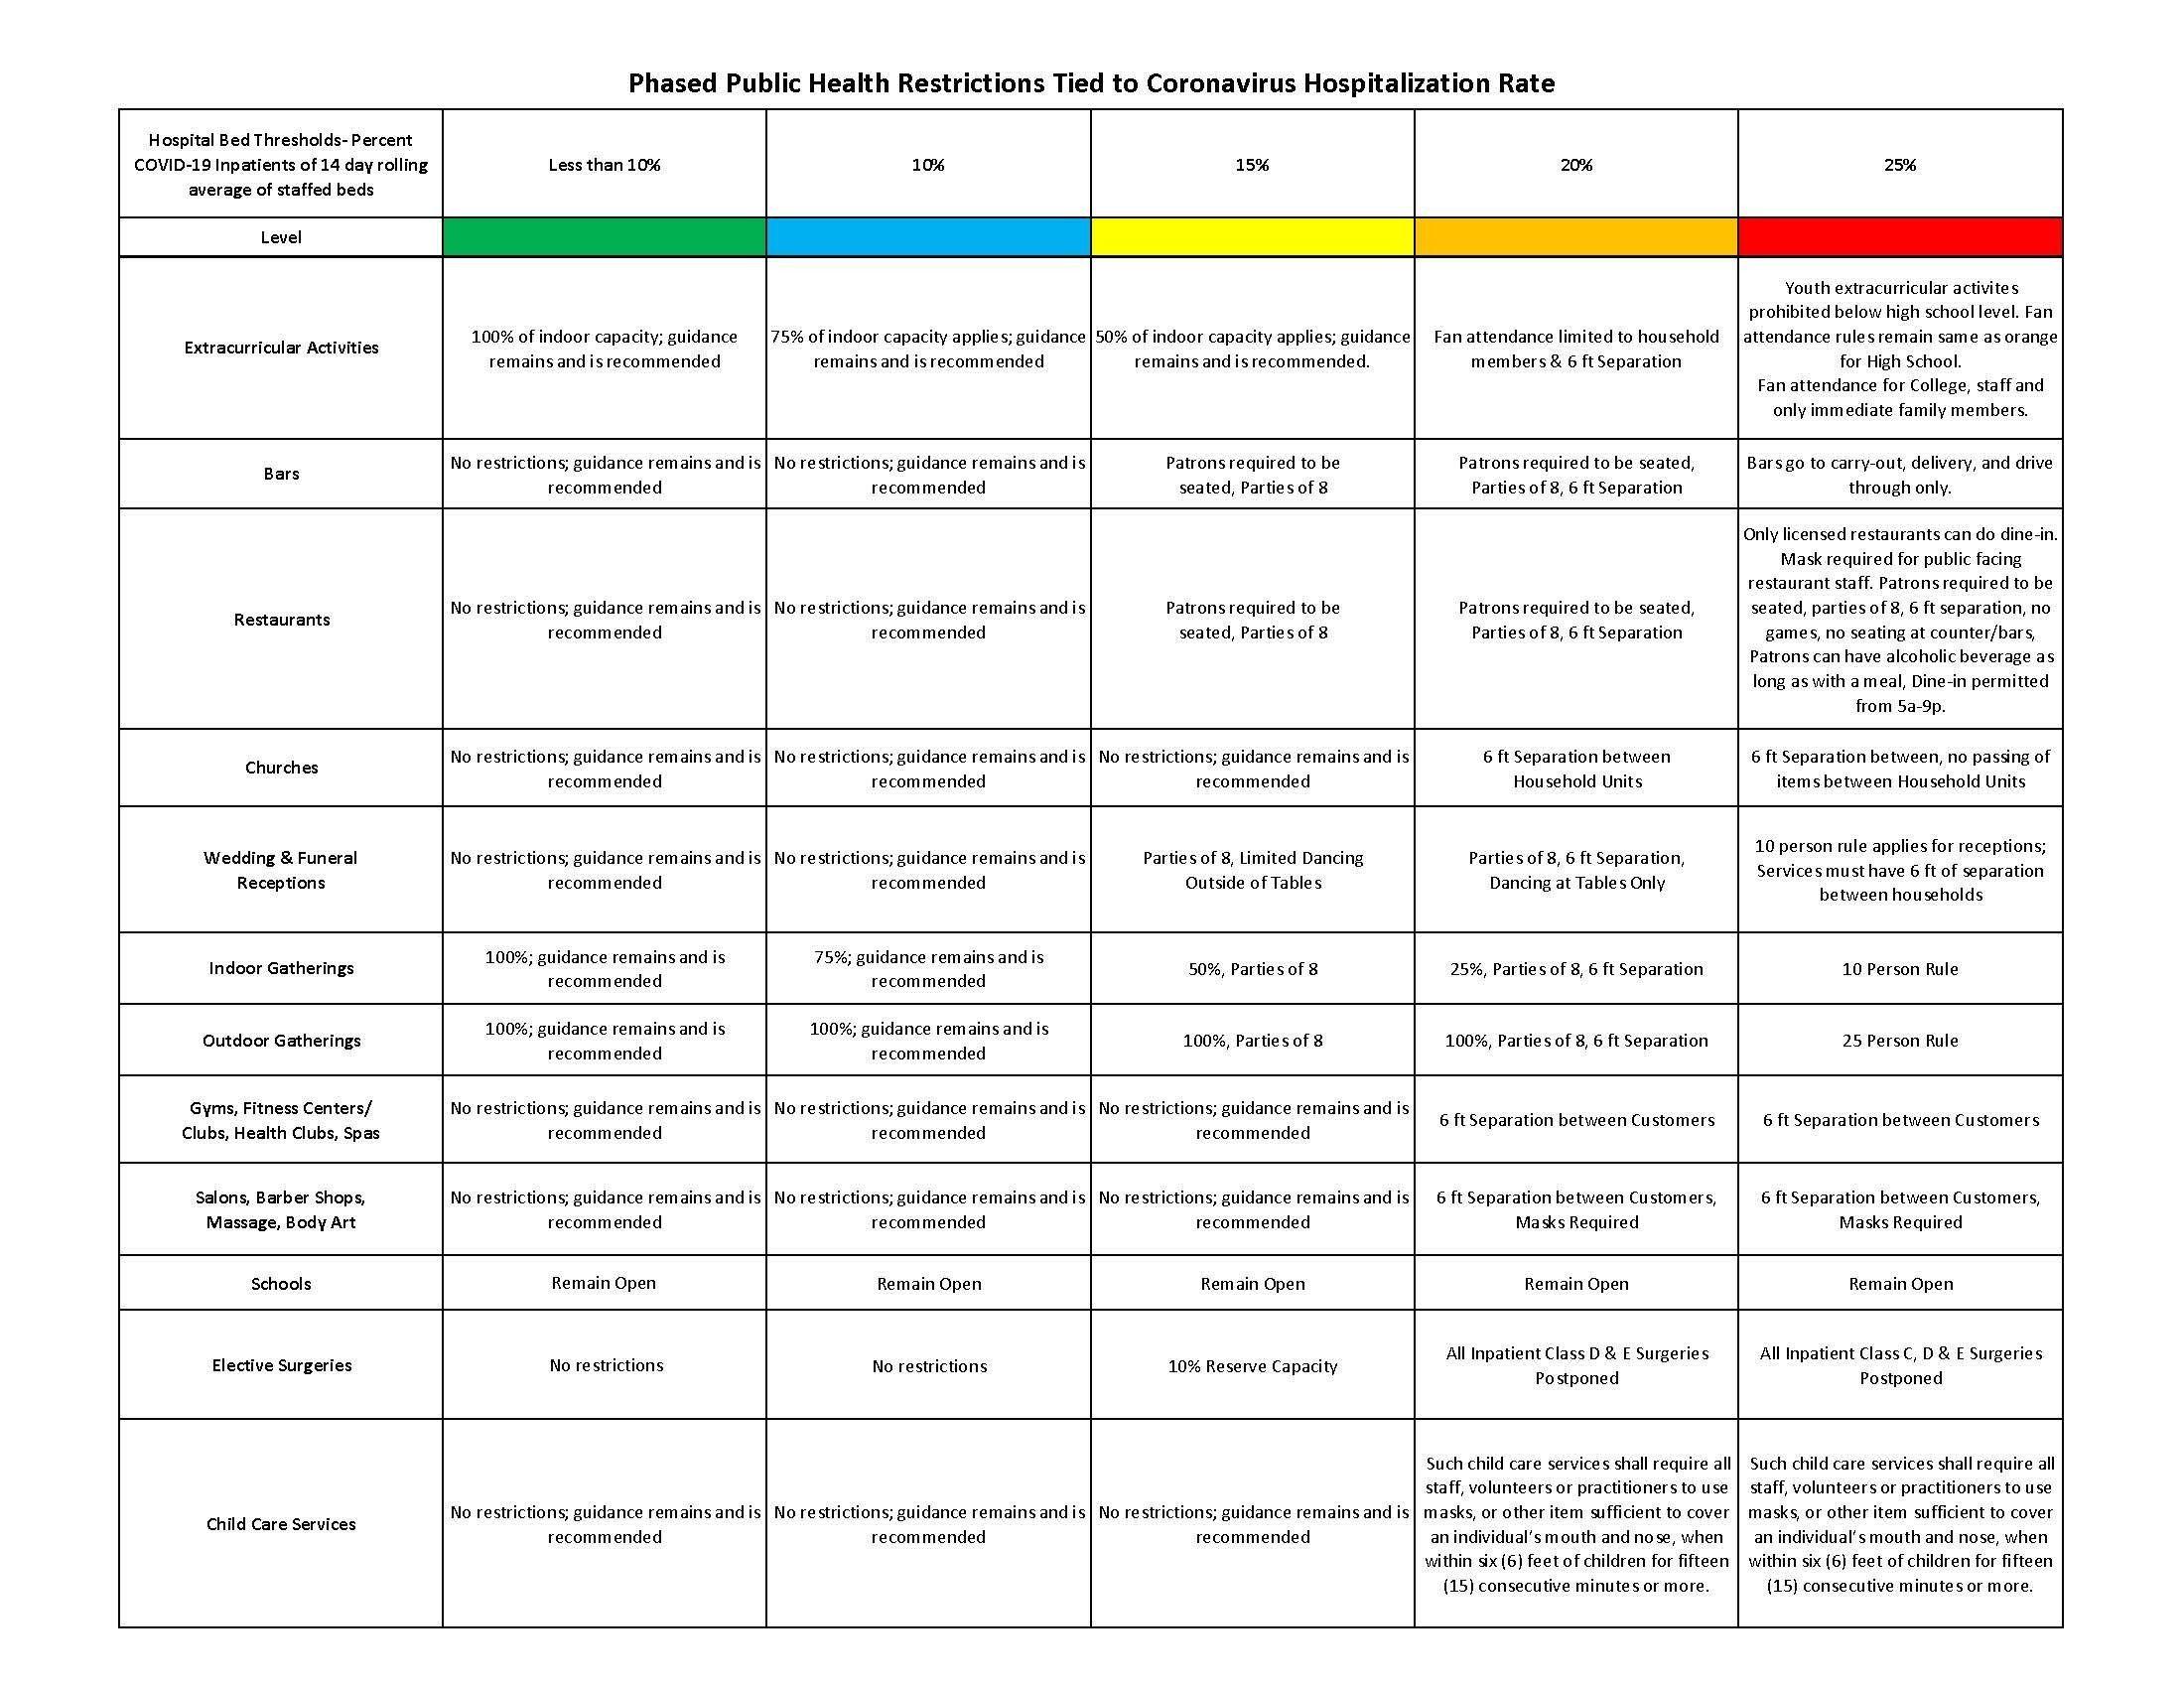 New Directive Health Measures